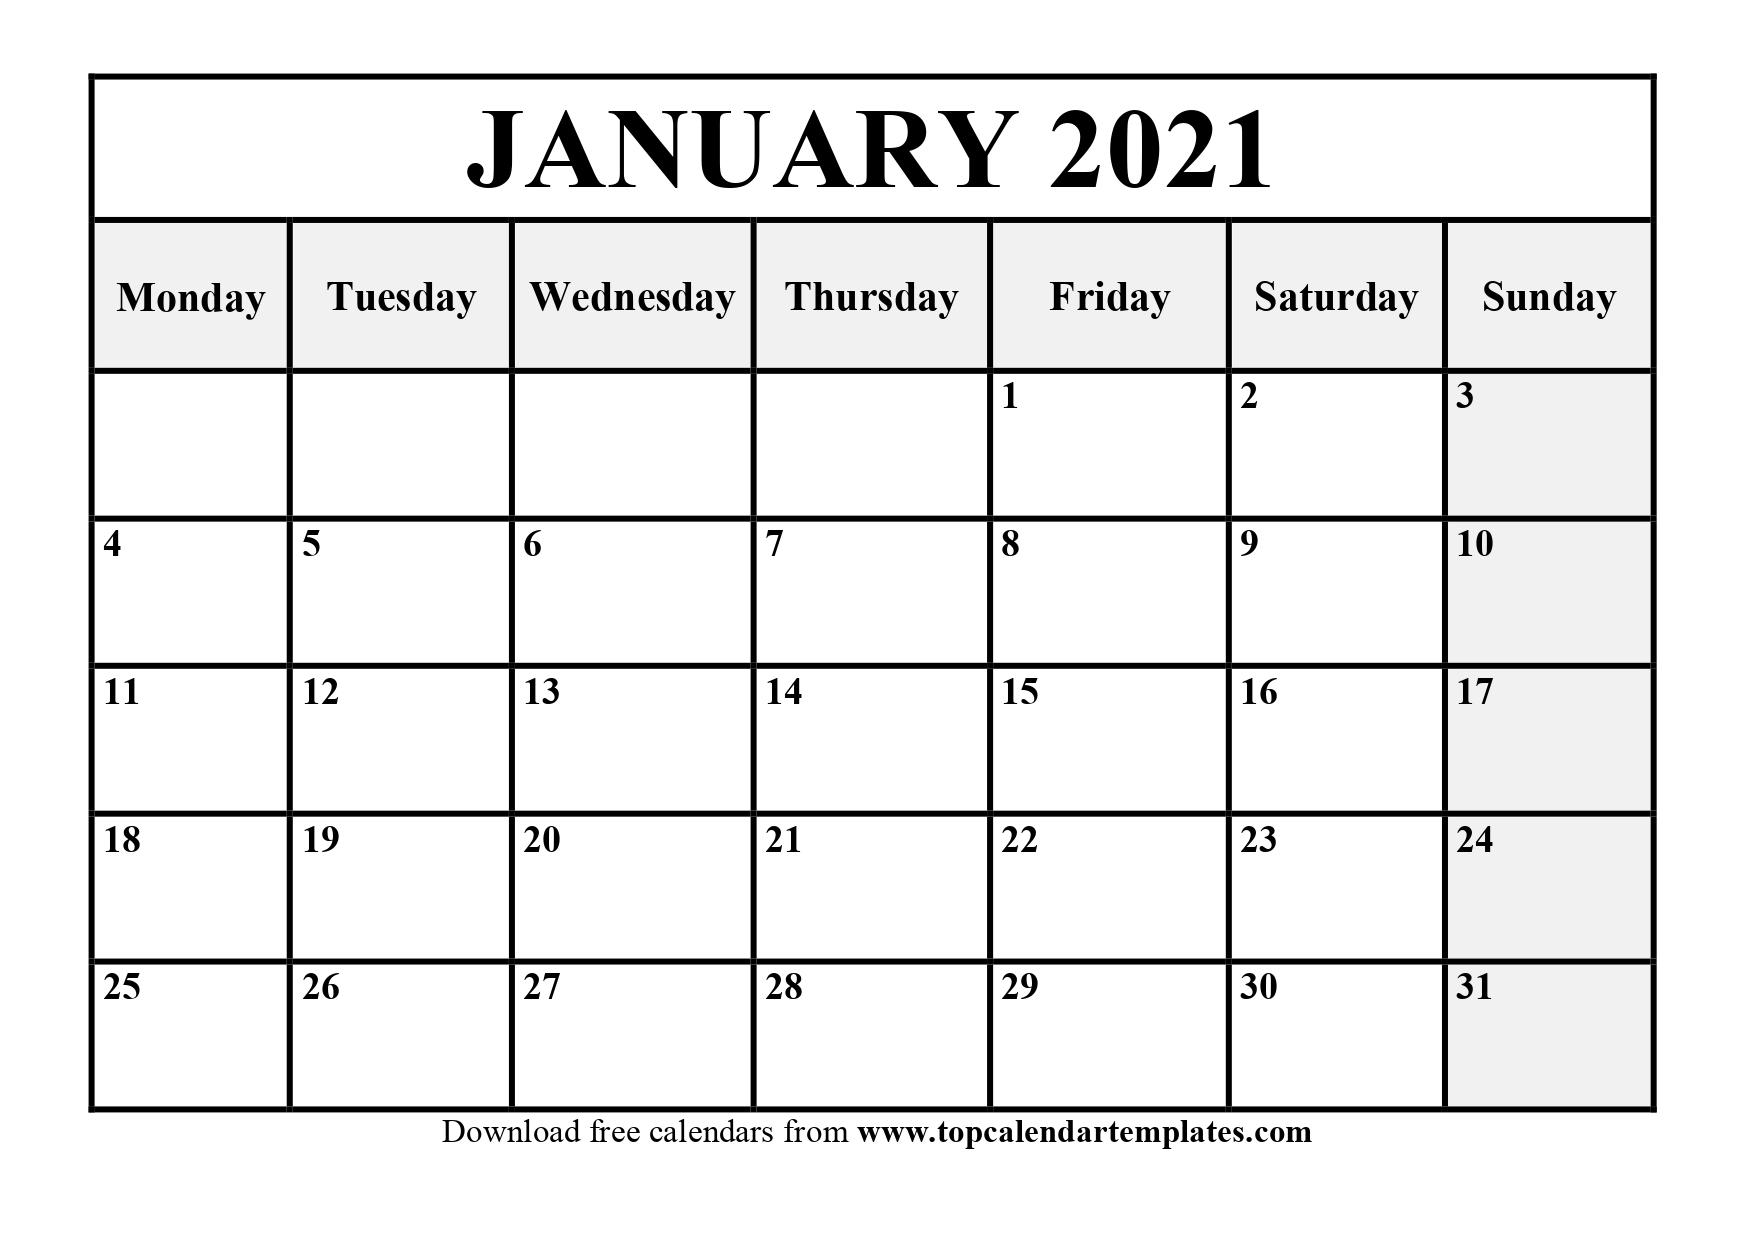 Free January 2021 Calendar Printable Pdf Word 7